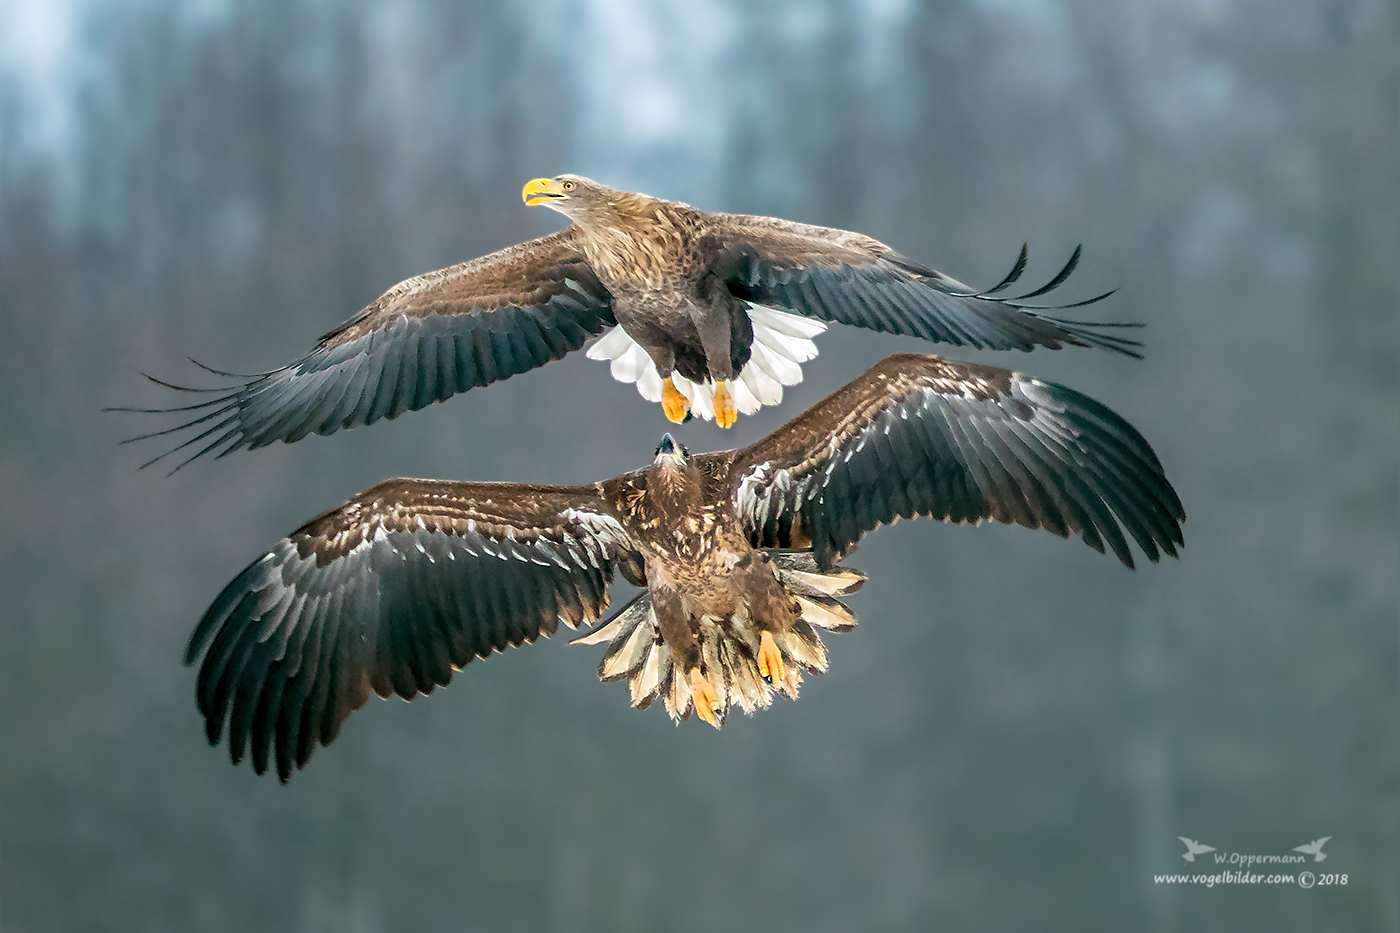 juv.Seeadler vs. adult Seeadler